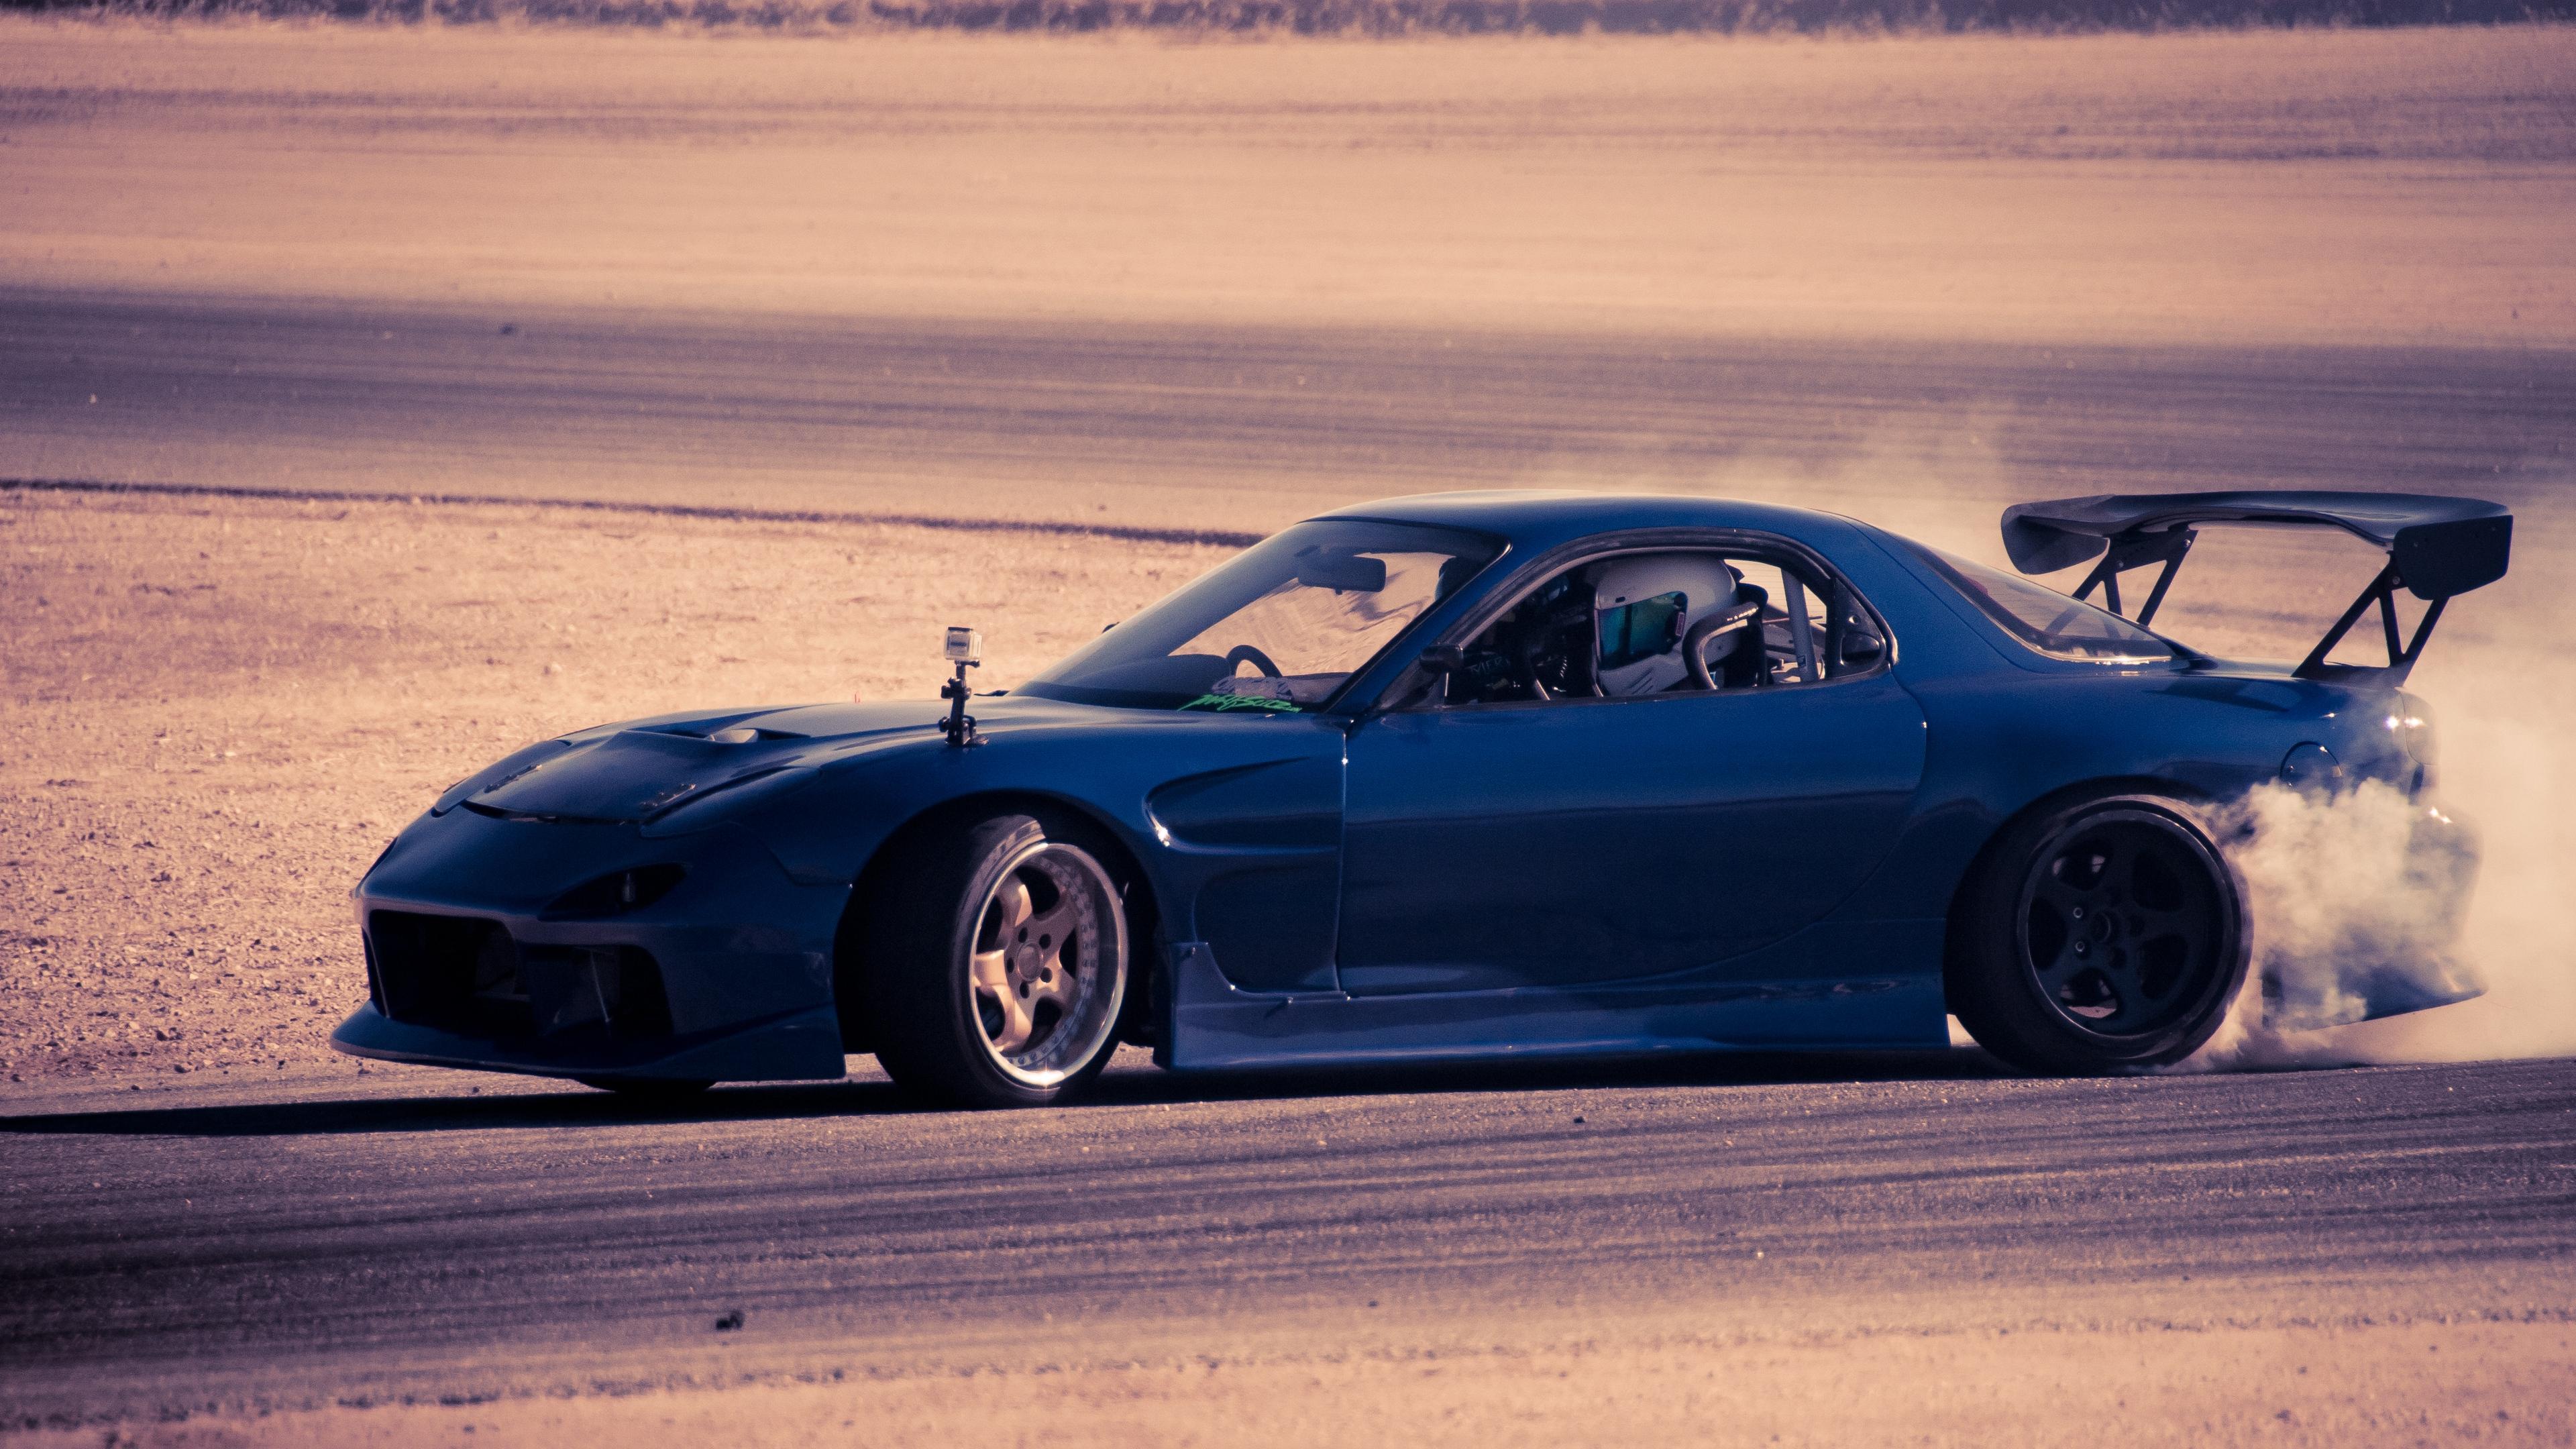 mazda rx 7 blue cars speed 4k 1538937549 - mazda, rx 7, blue, cars, speed 4k - rx 7, Mazda, blue